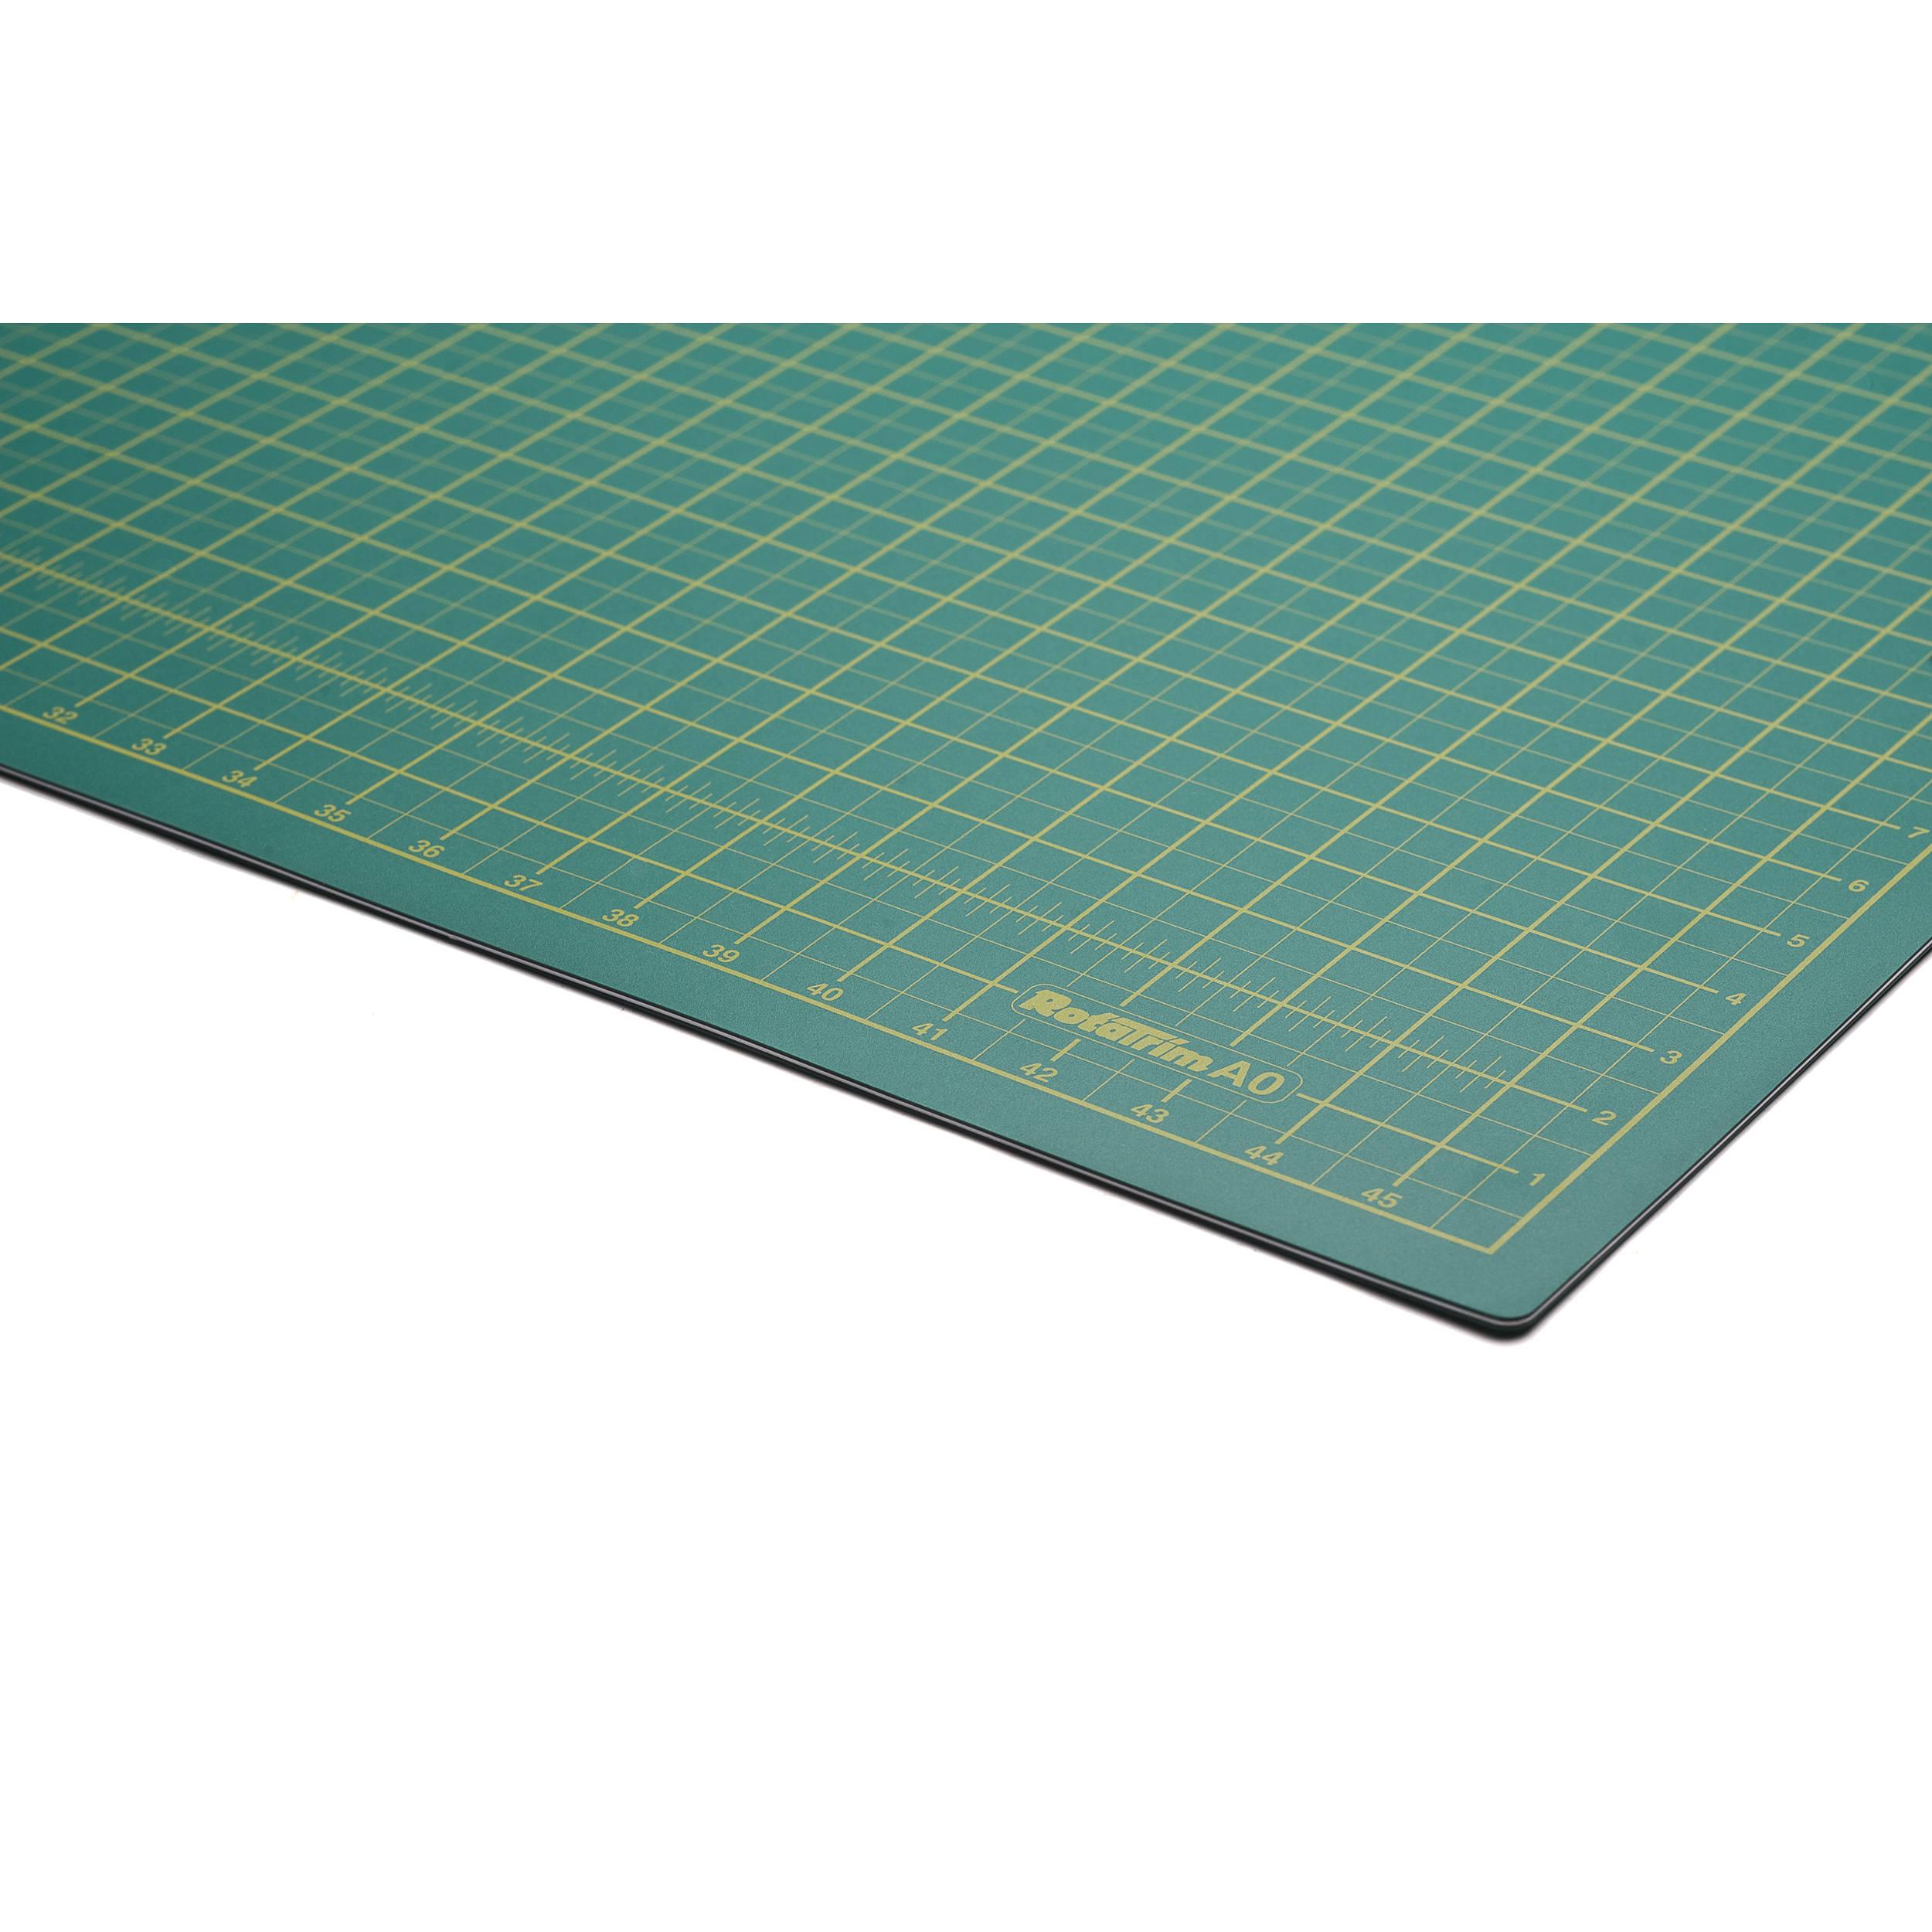 durable patchwork pvc green diy plotter quilting flexible accessories item mats handmade from in office self sea mat healing board cutting